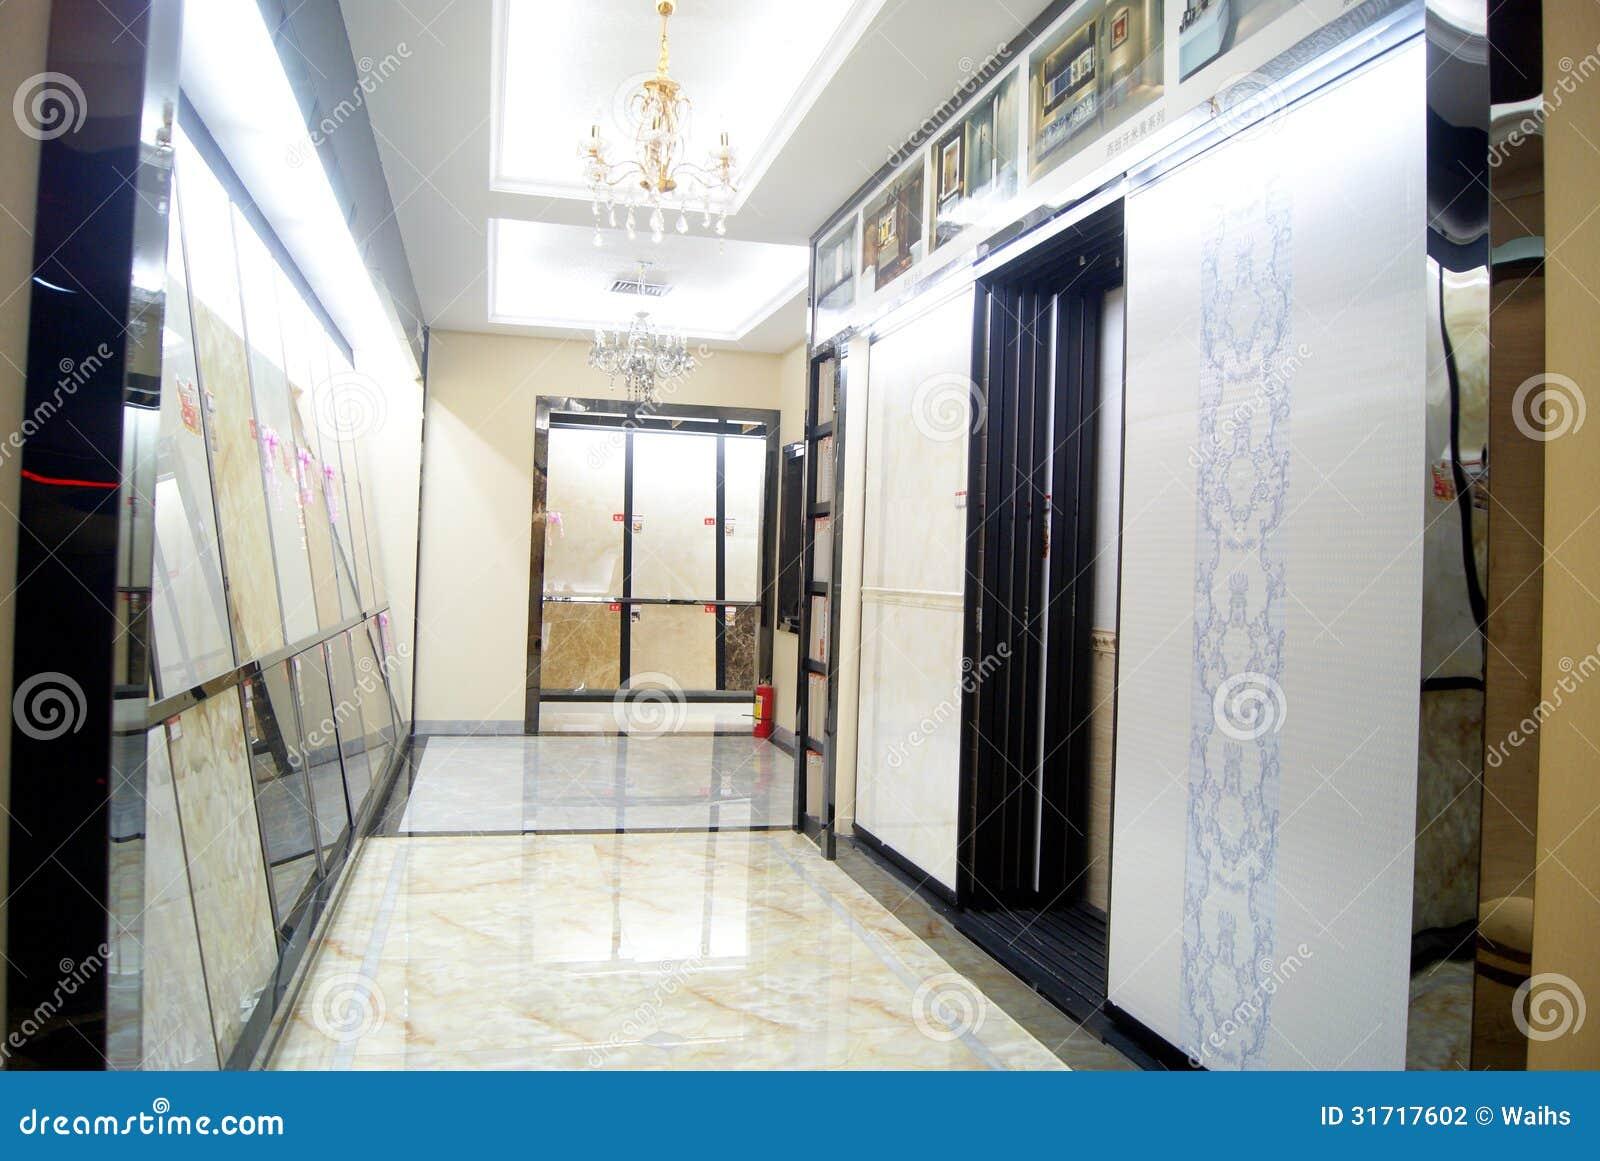 Shenzhen China Xixiang Building Materials Furniture Market Editorial Photography Image 31717602